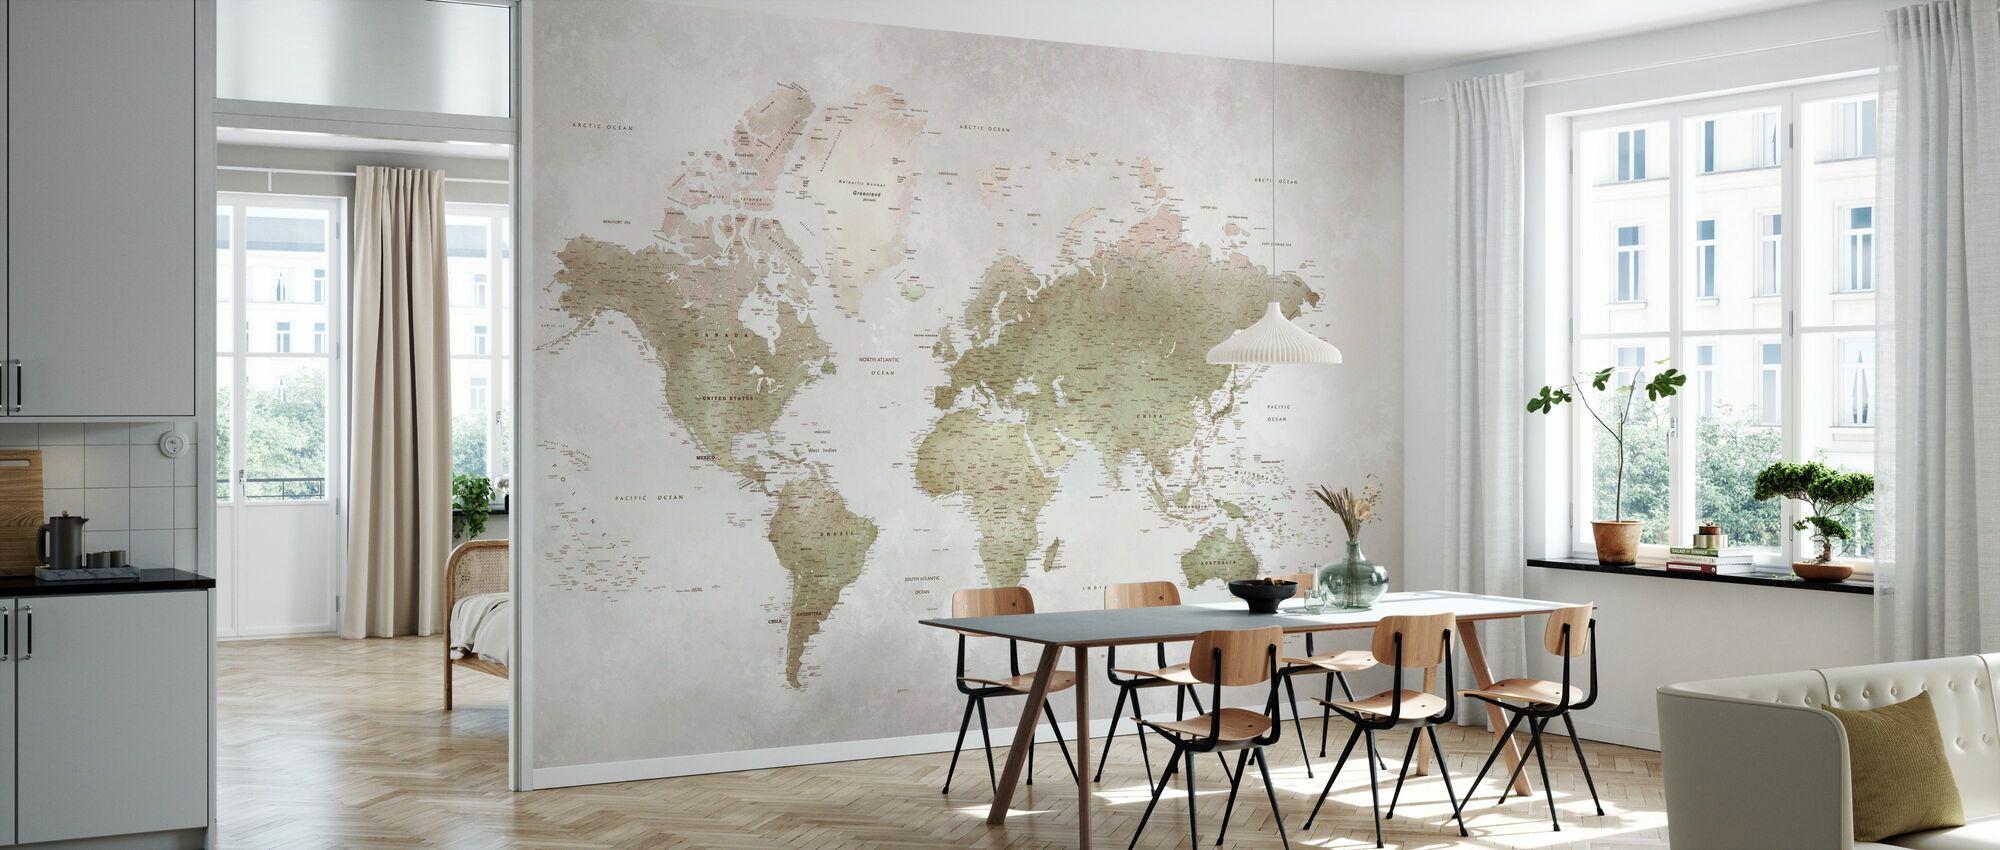 World Map - Smoky - Wallpaper - Kitchen